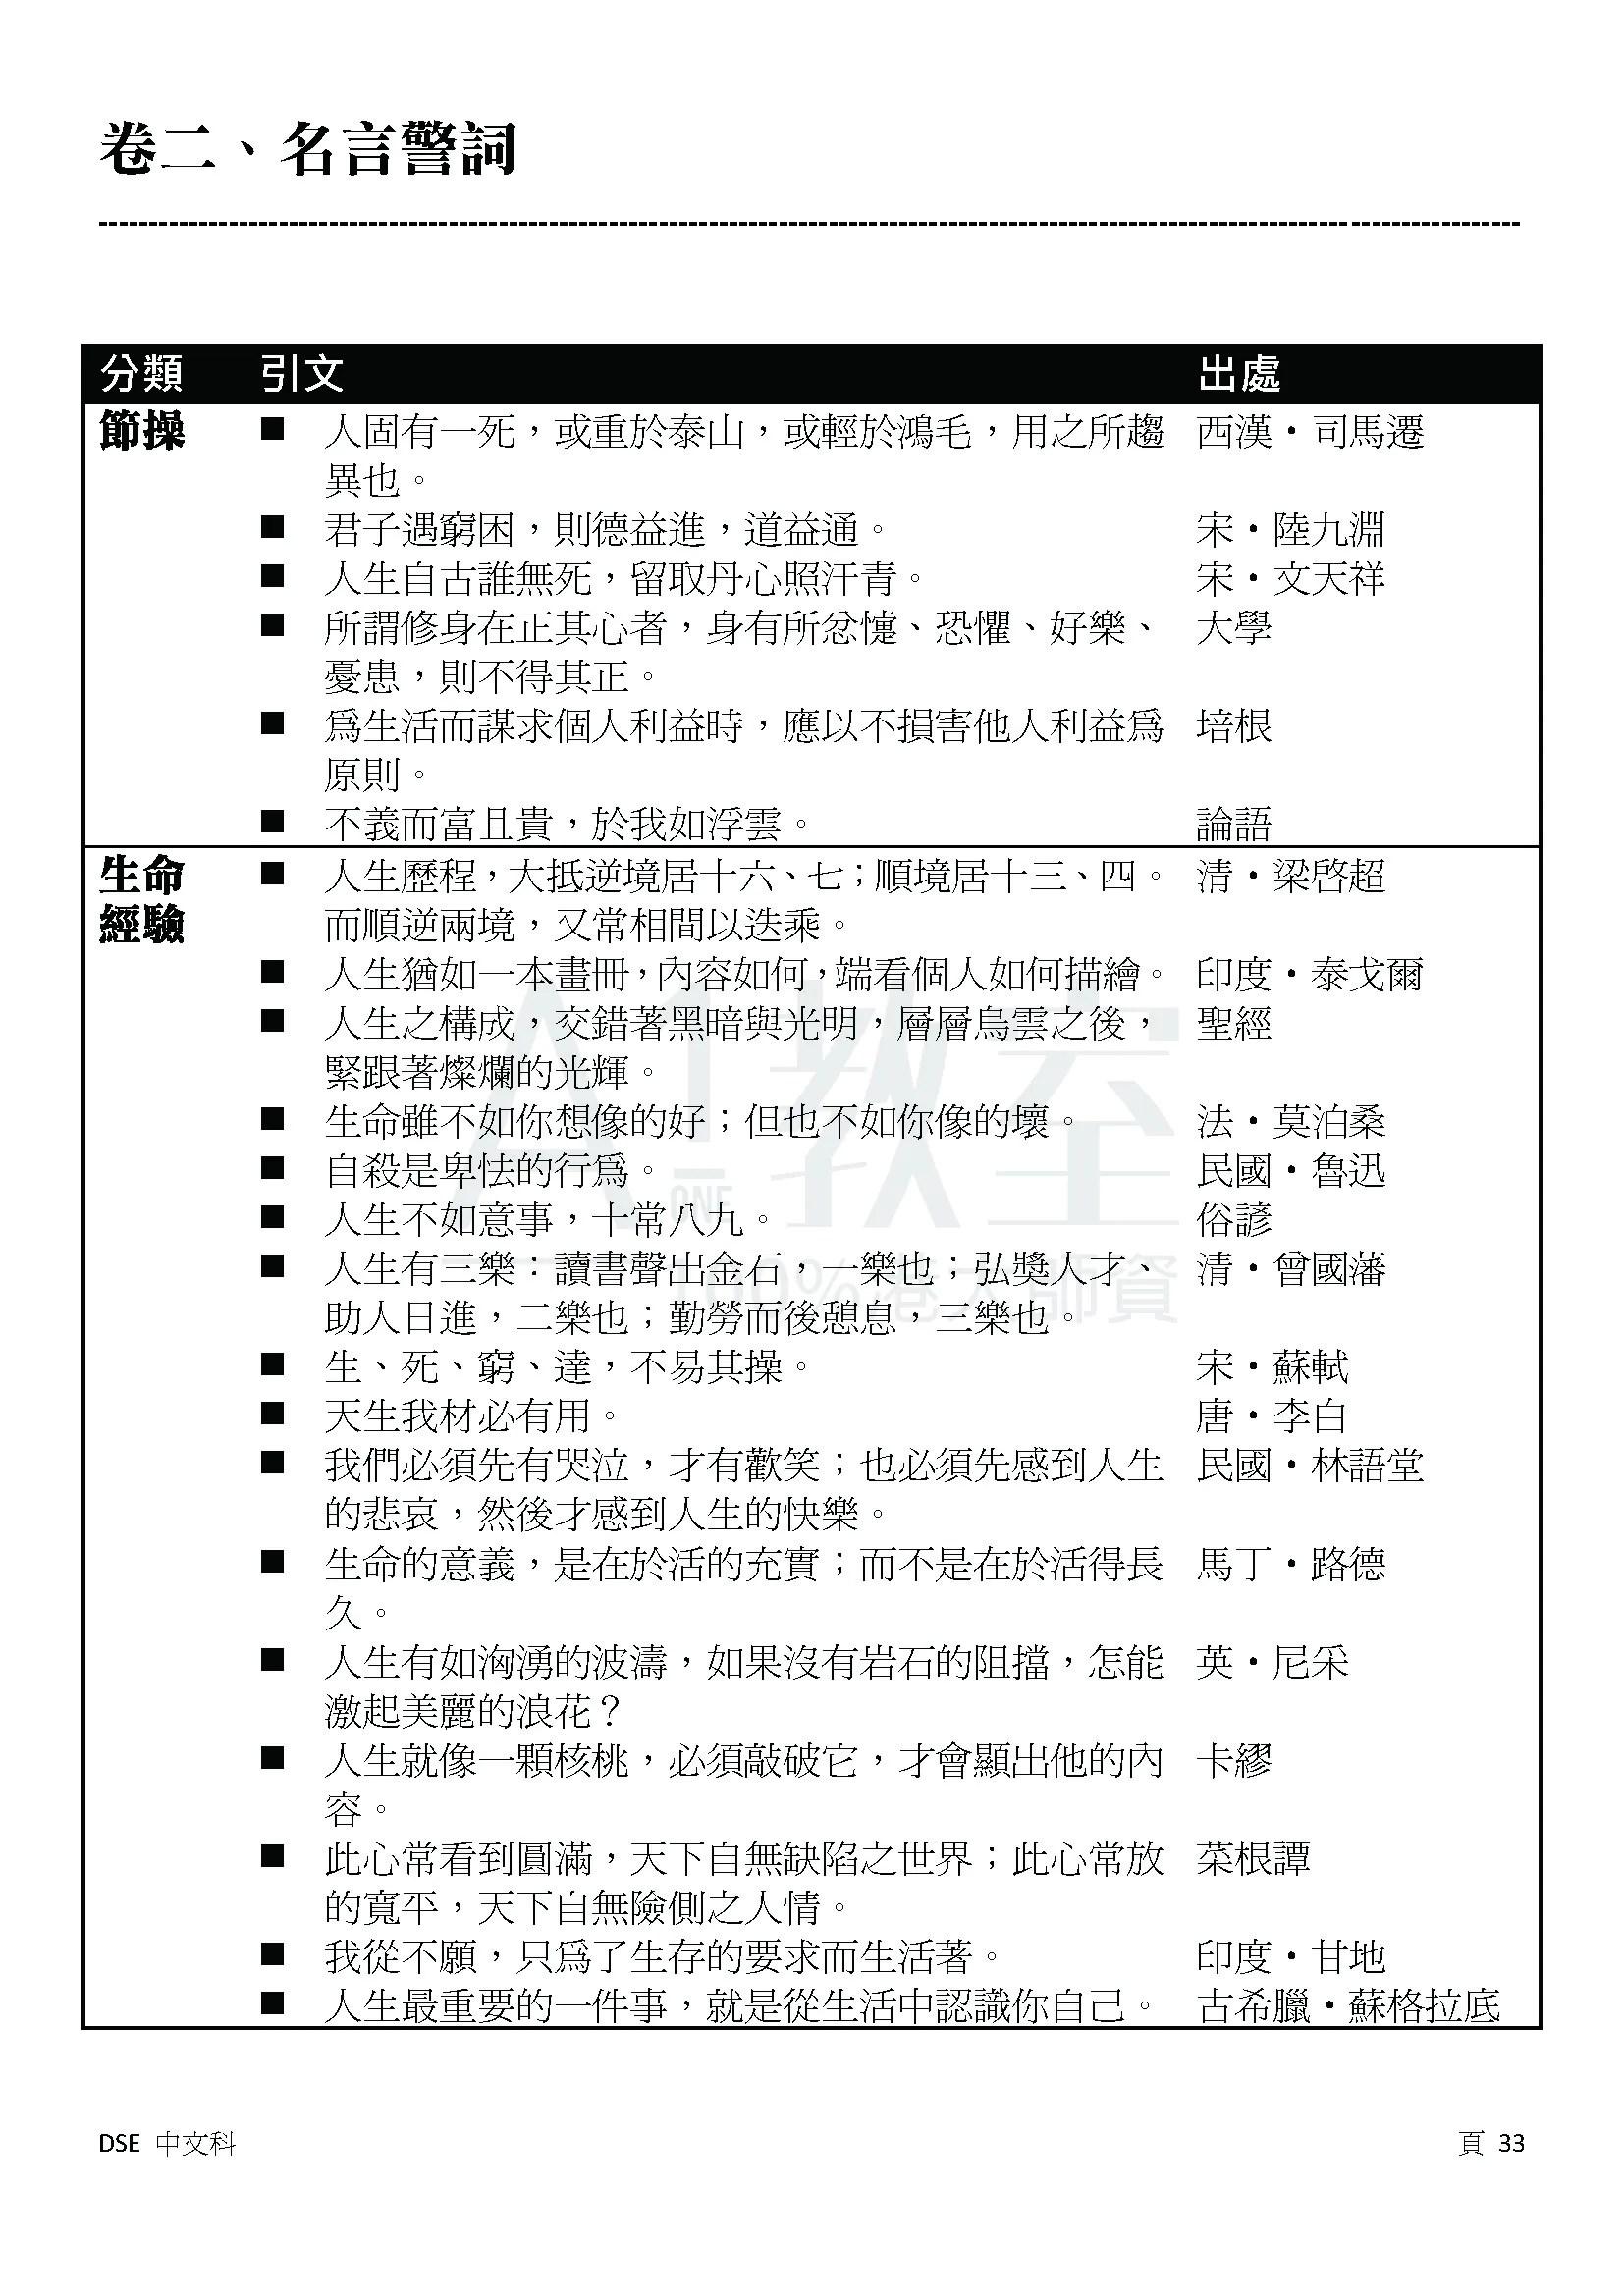 DSE中文提升課程 – A1教室